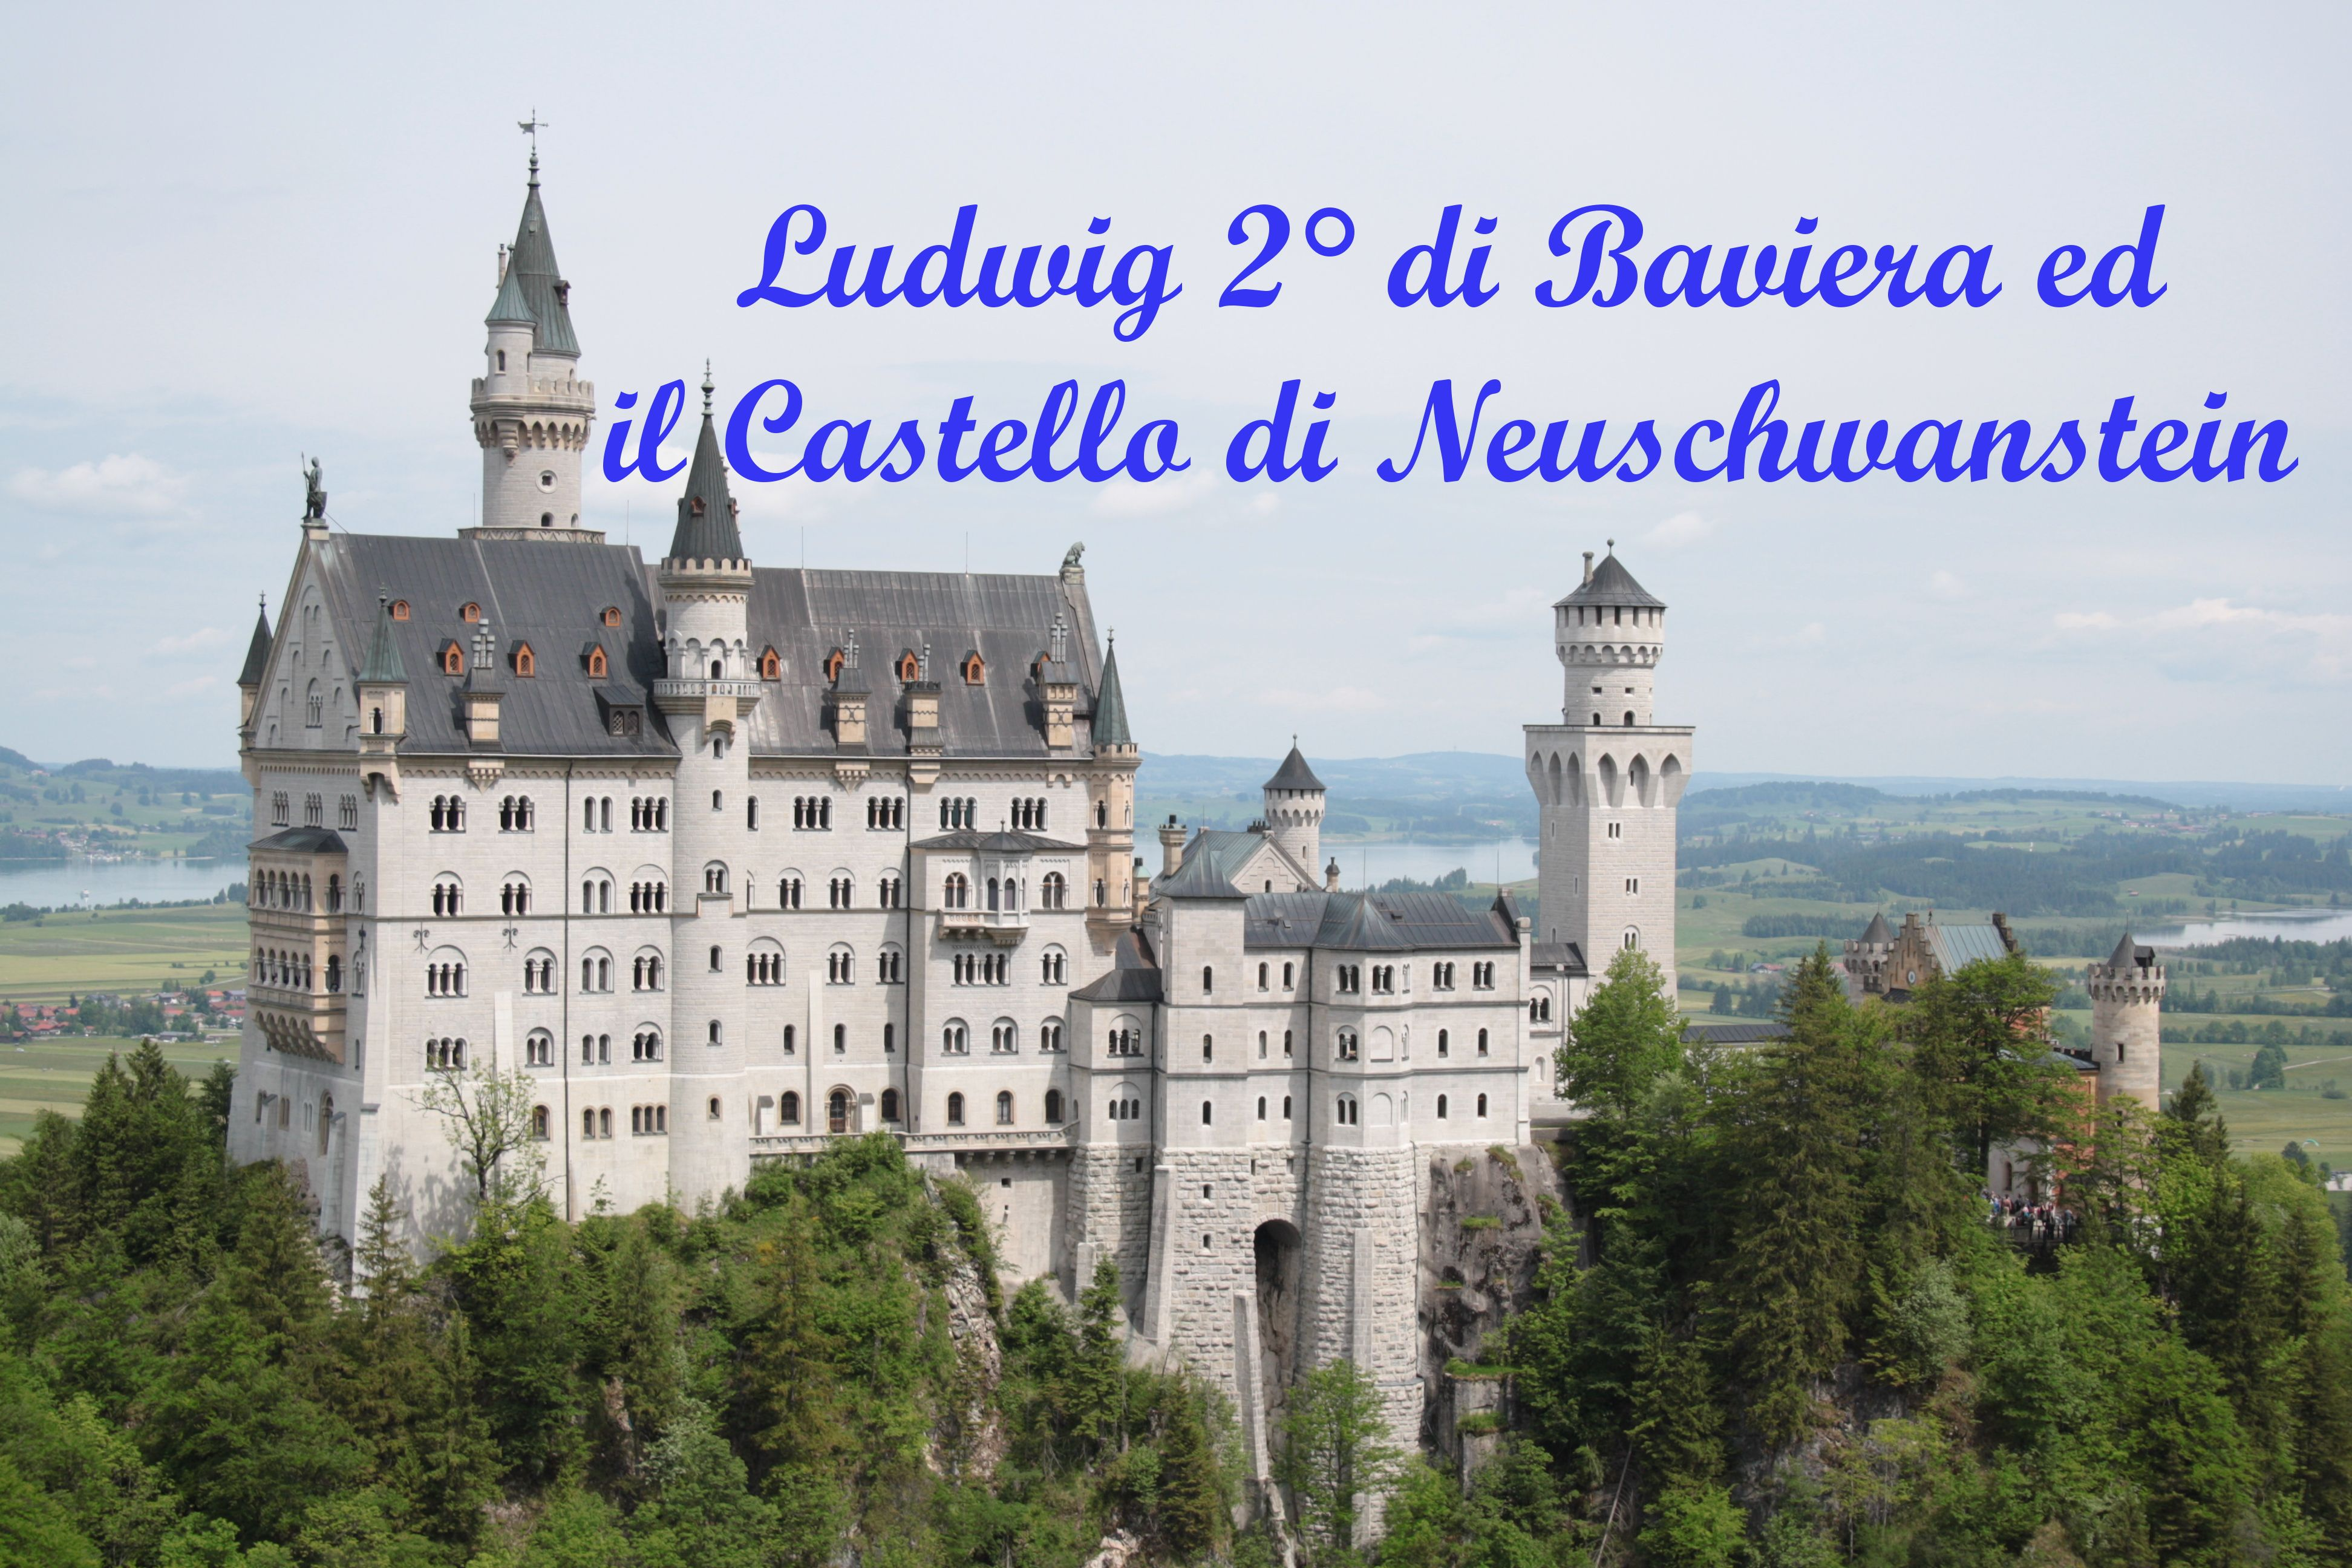 castello-baviera-mytravelife-cover.jpg (3888×2592)